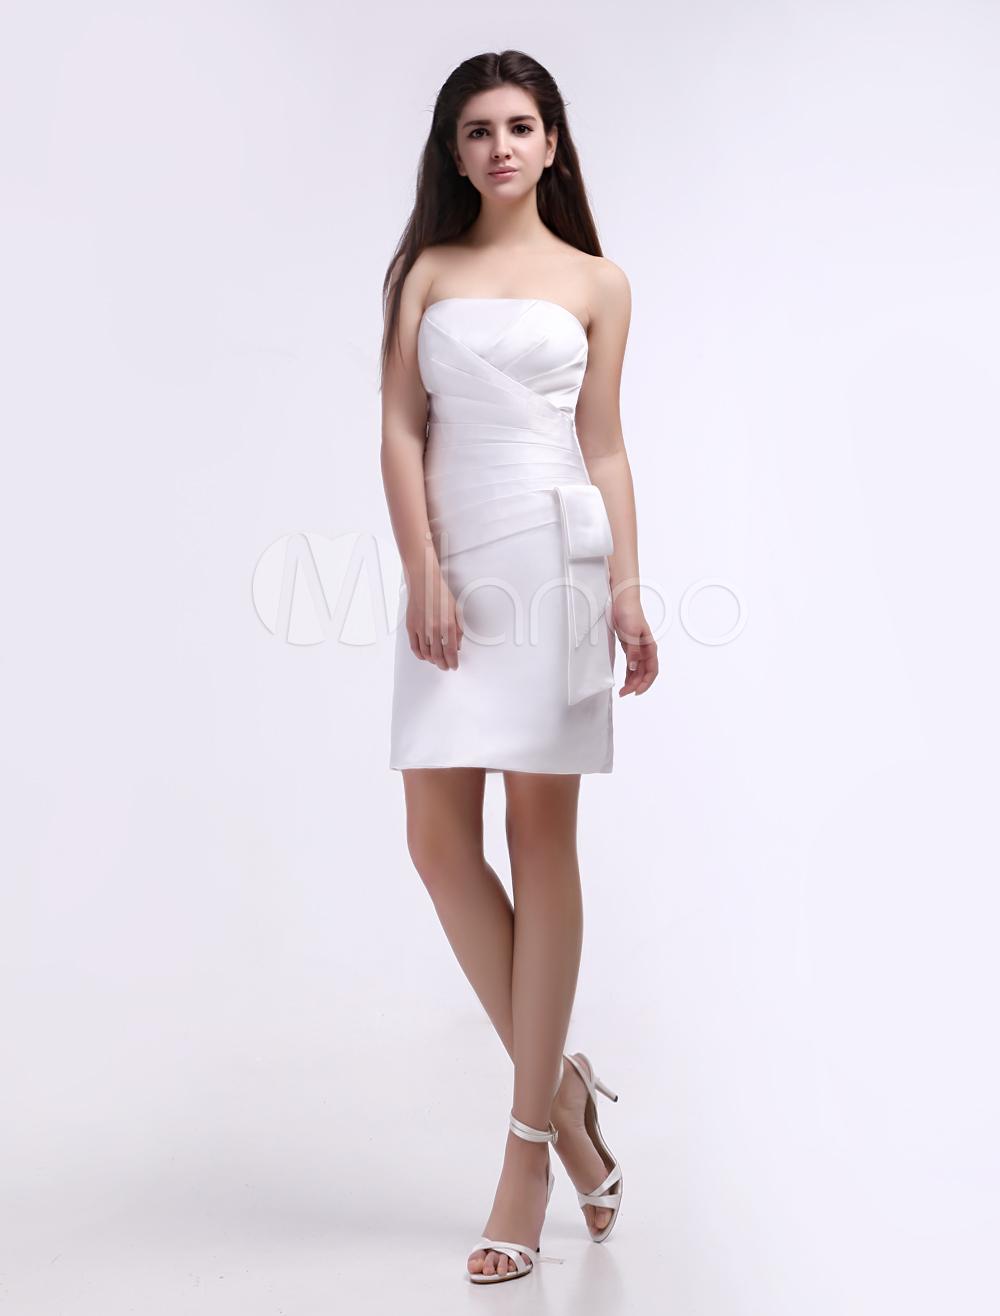 Kleid Eng Großhandel Kleid Eng Online | Milanoo.com